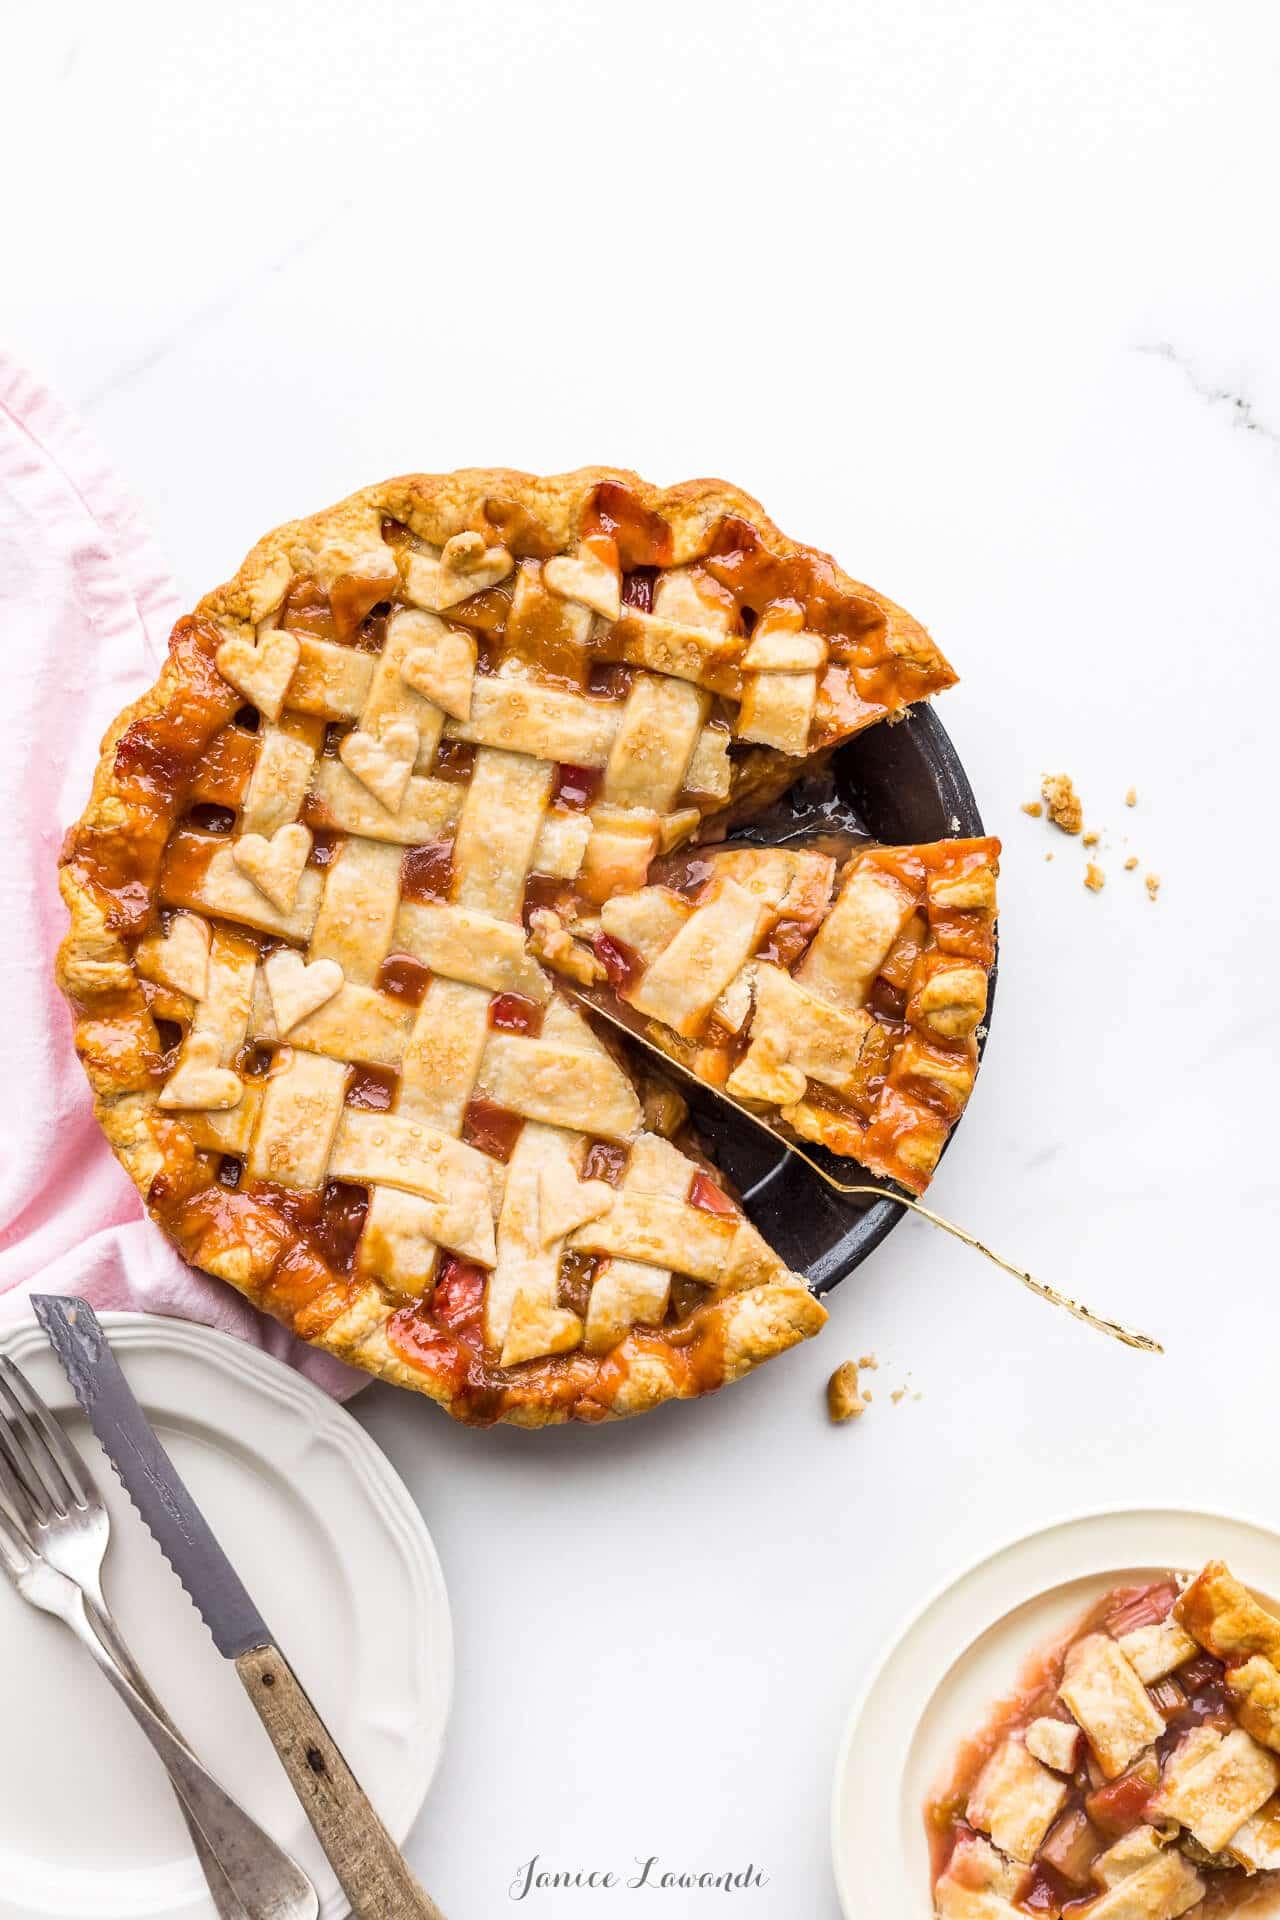 Slice of rhubarb pie with a lattice pie crust